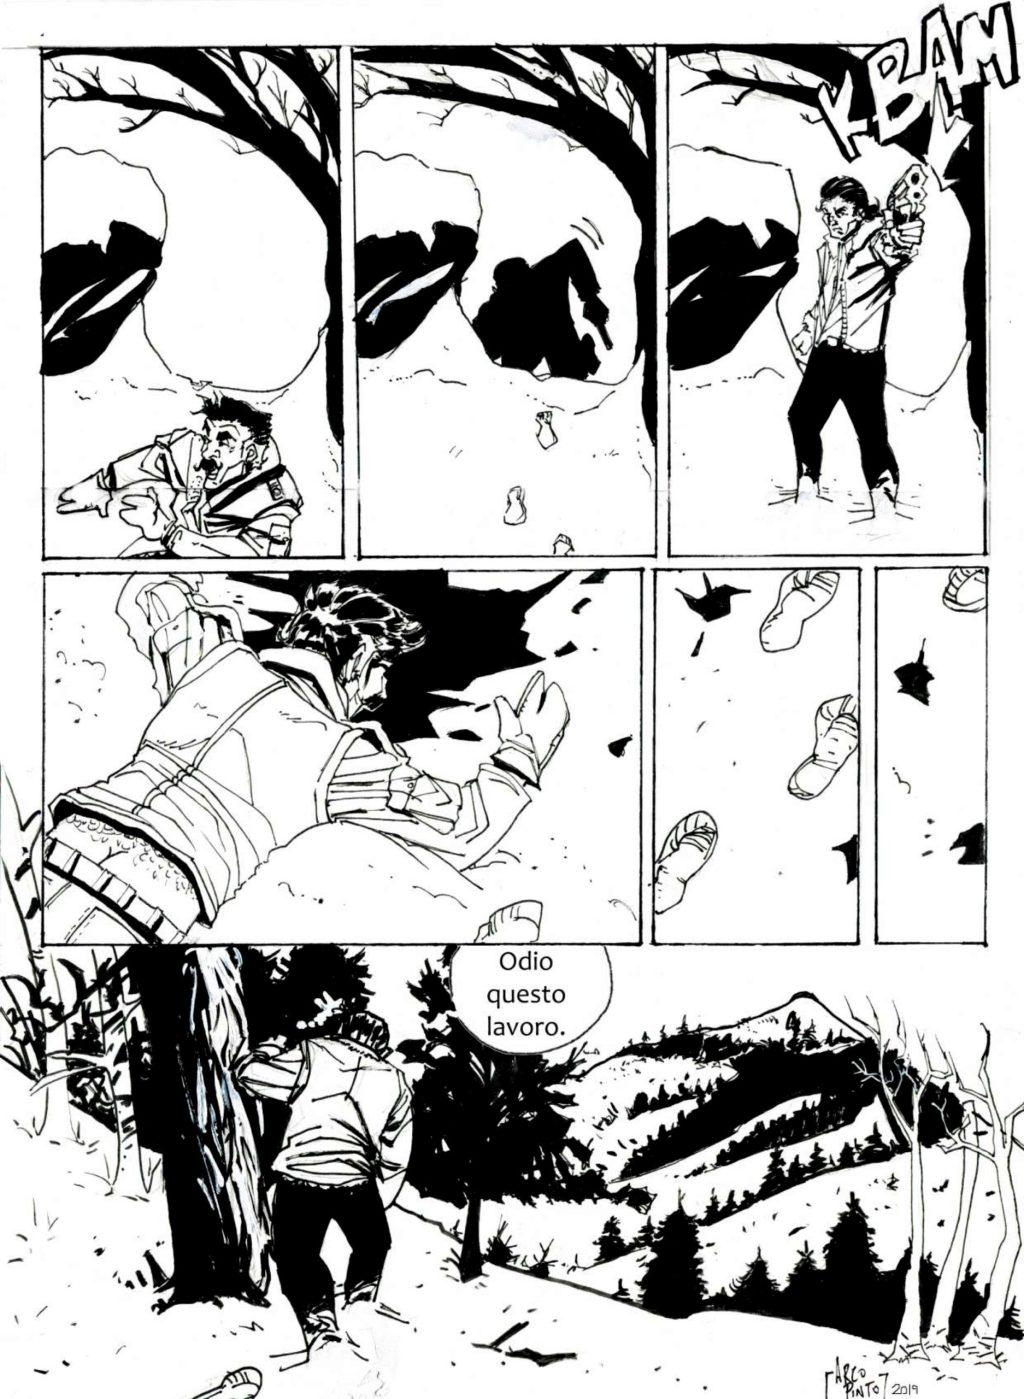 fumetti da leggere in pdf